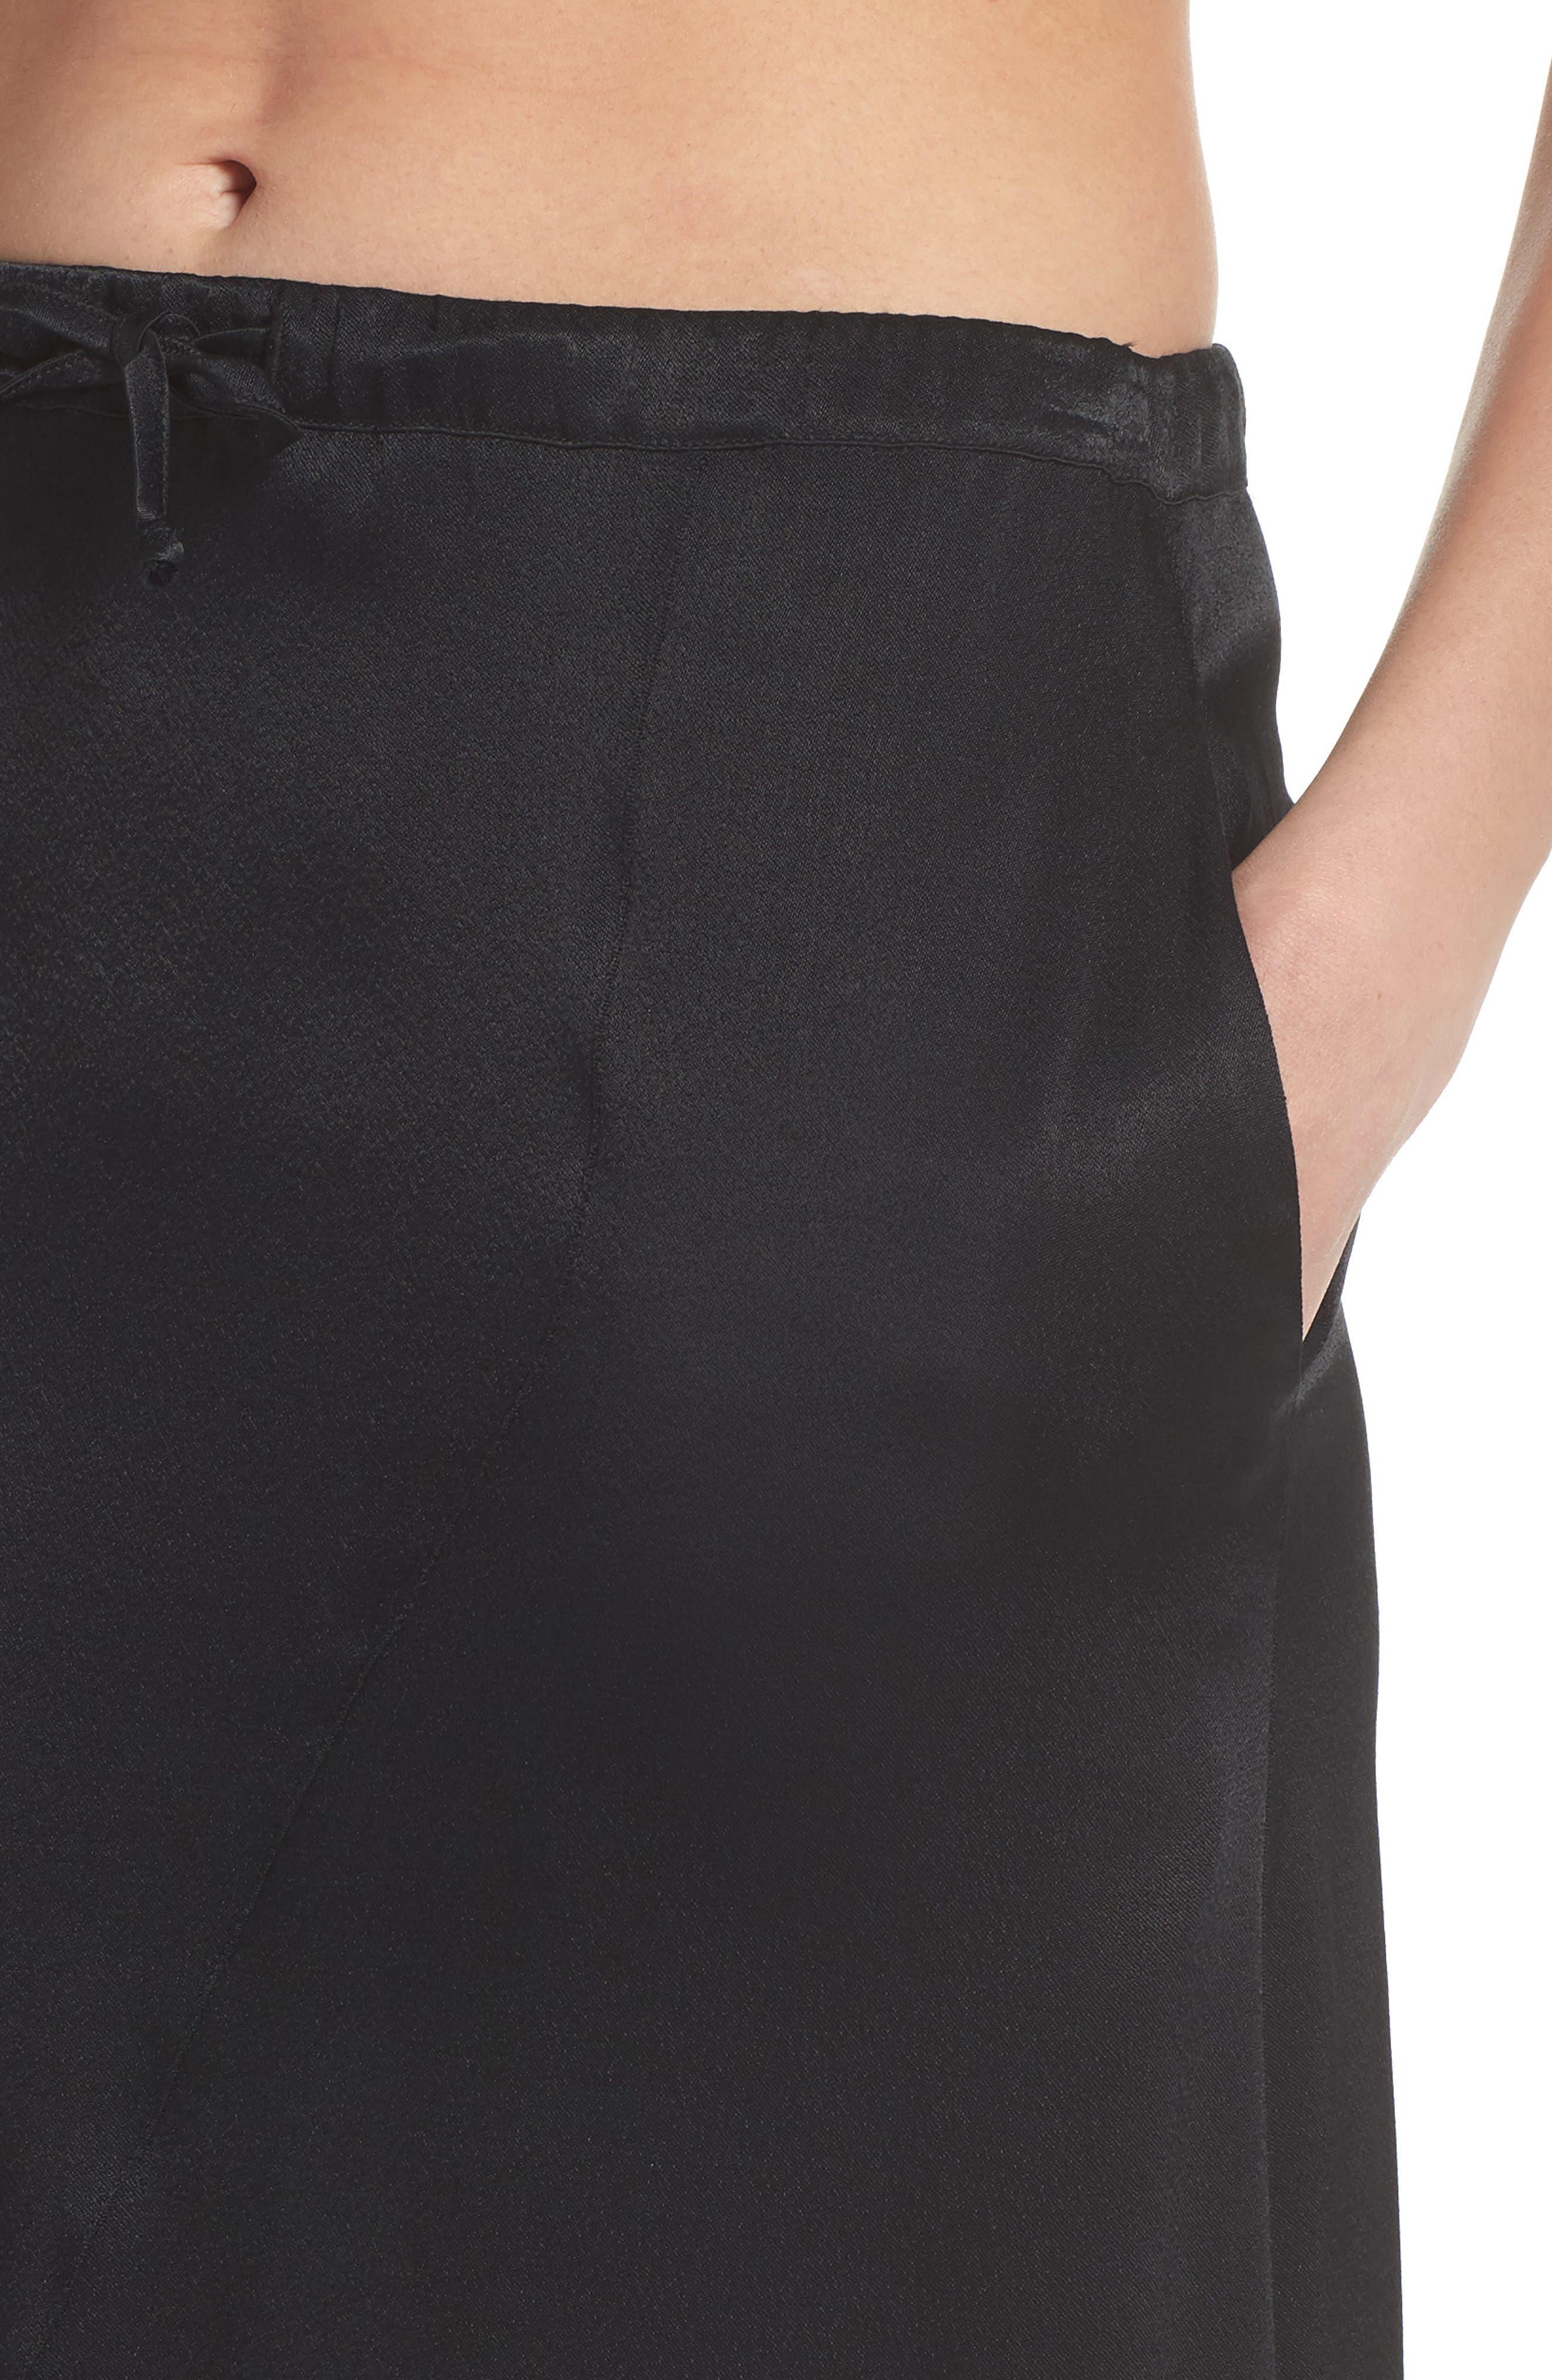 Lace Trim Slip Skirt,                             Alternate thumbnail 5, color,                             Black